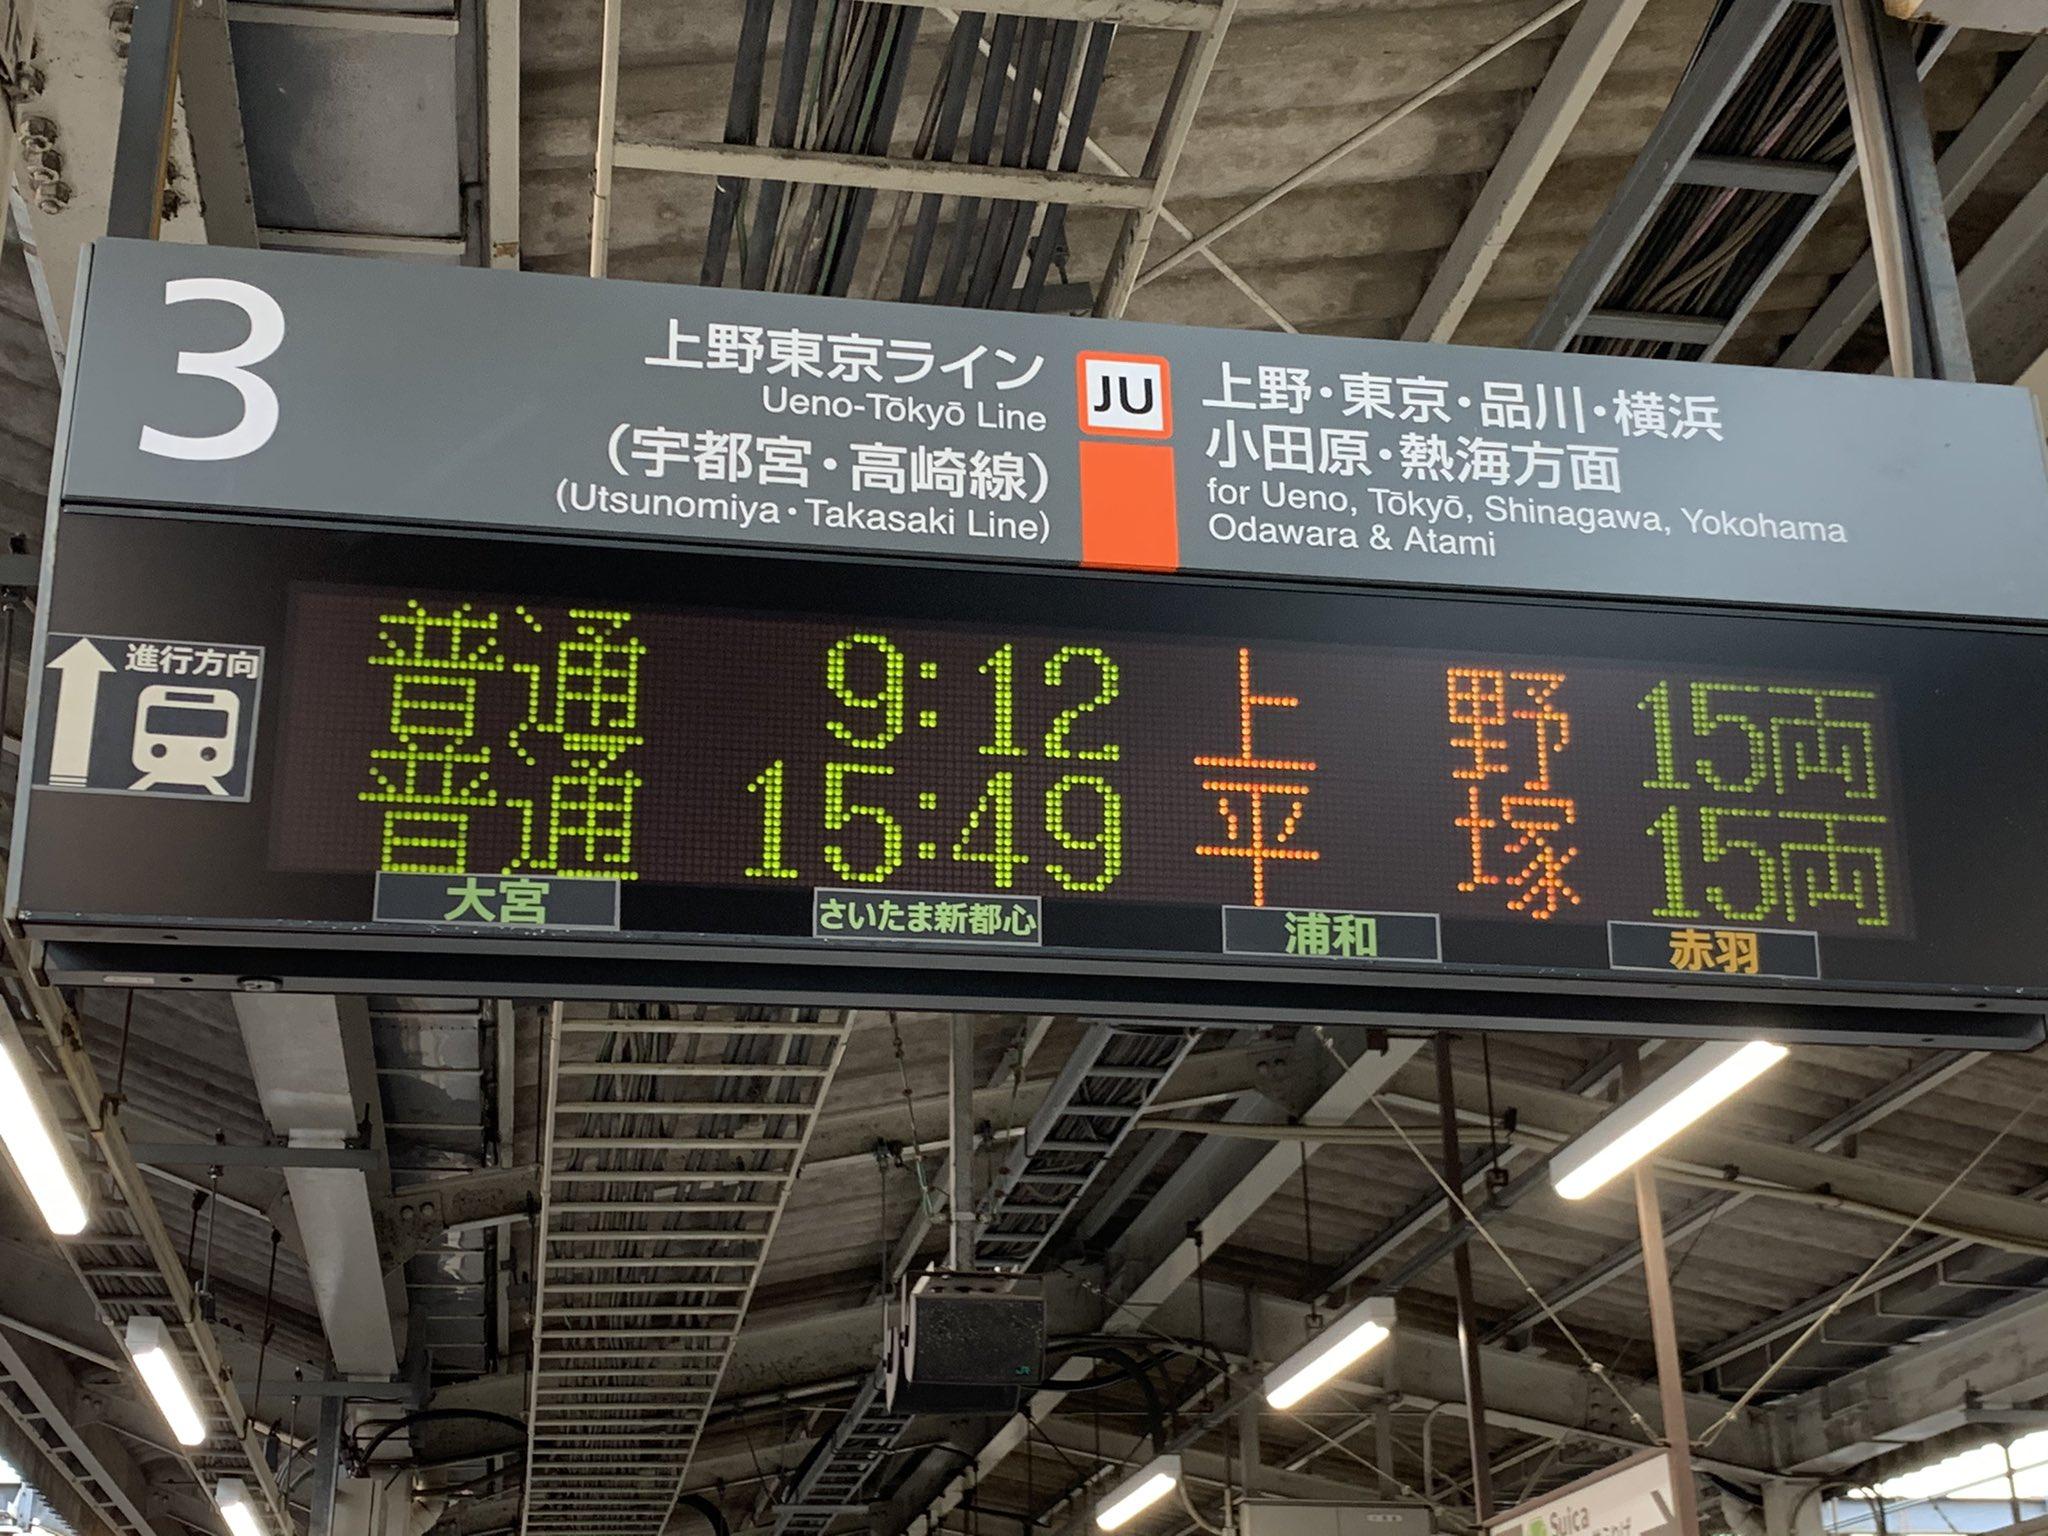 【JR東日本】変電所火災が発生していた宇都宮線が運転再開 最大で7時間遅れ